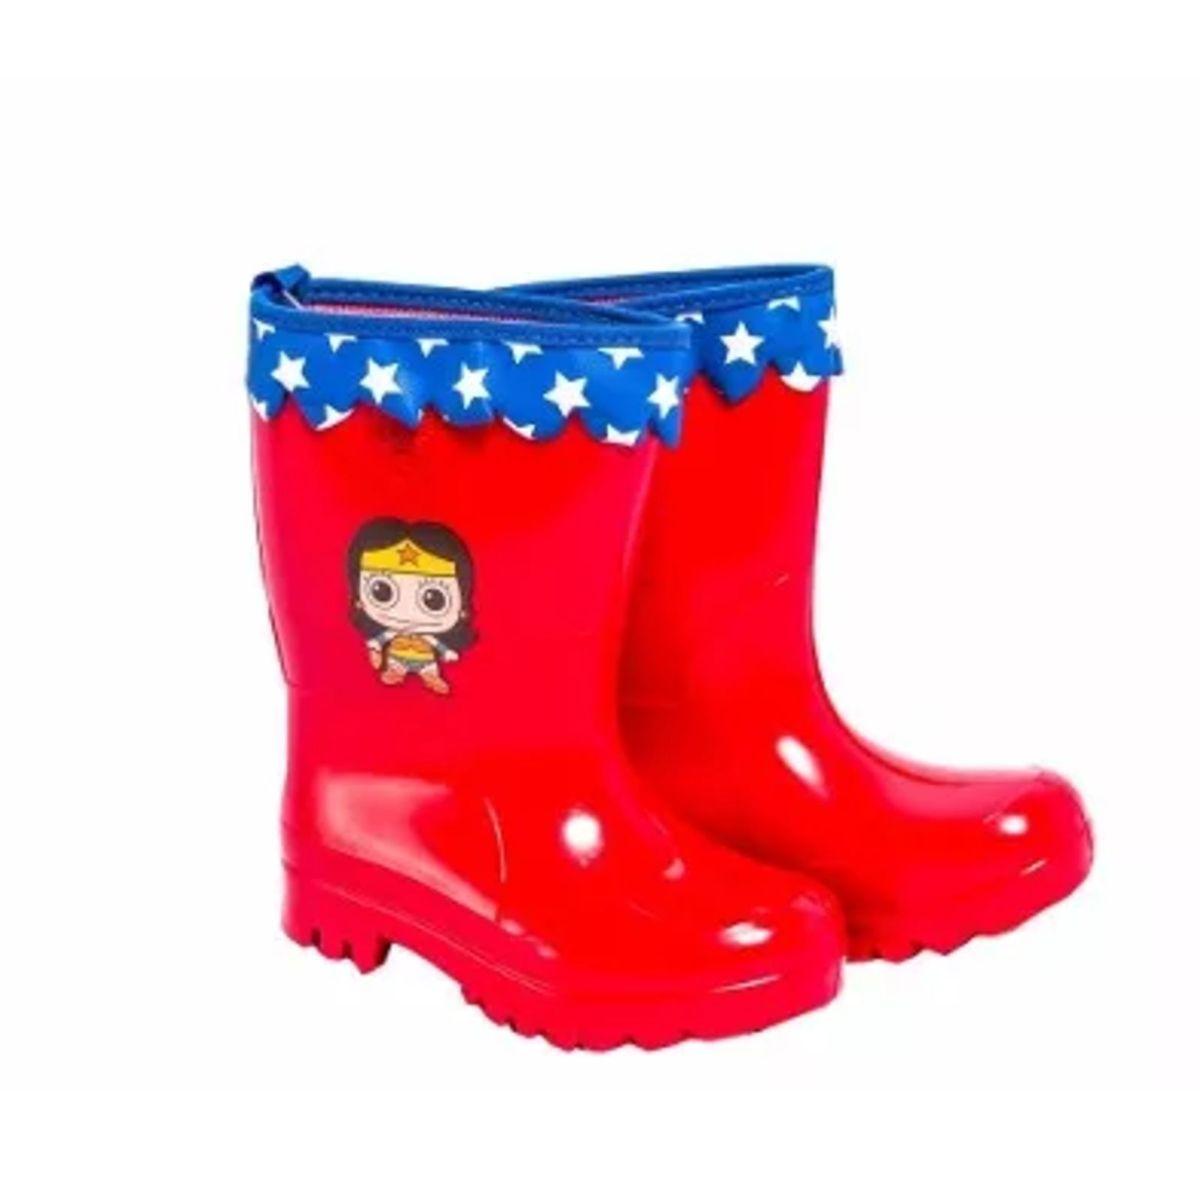 8cb40bed574 bota galocha infantil - mulher maravilha - menina sete leguas